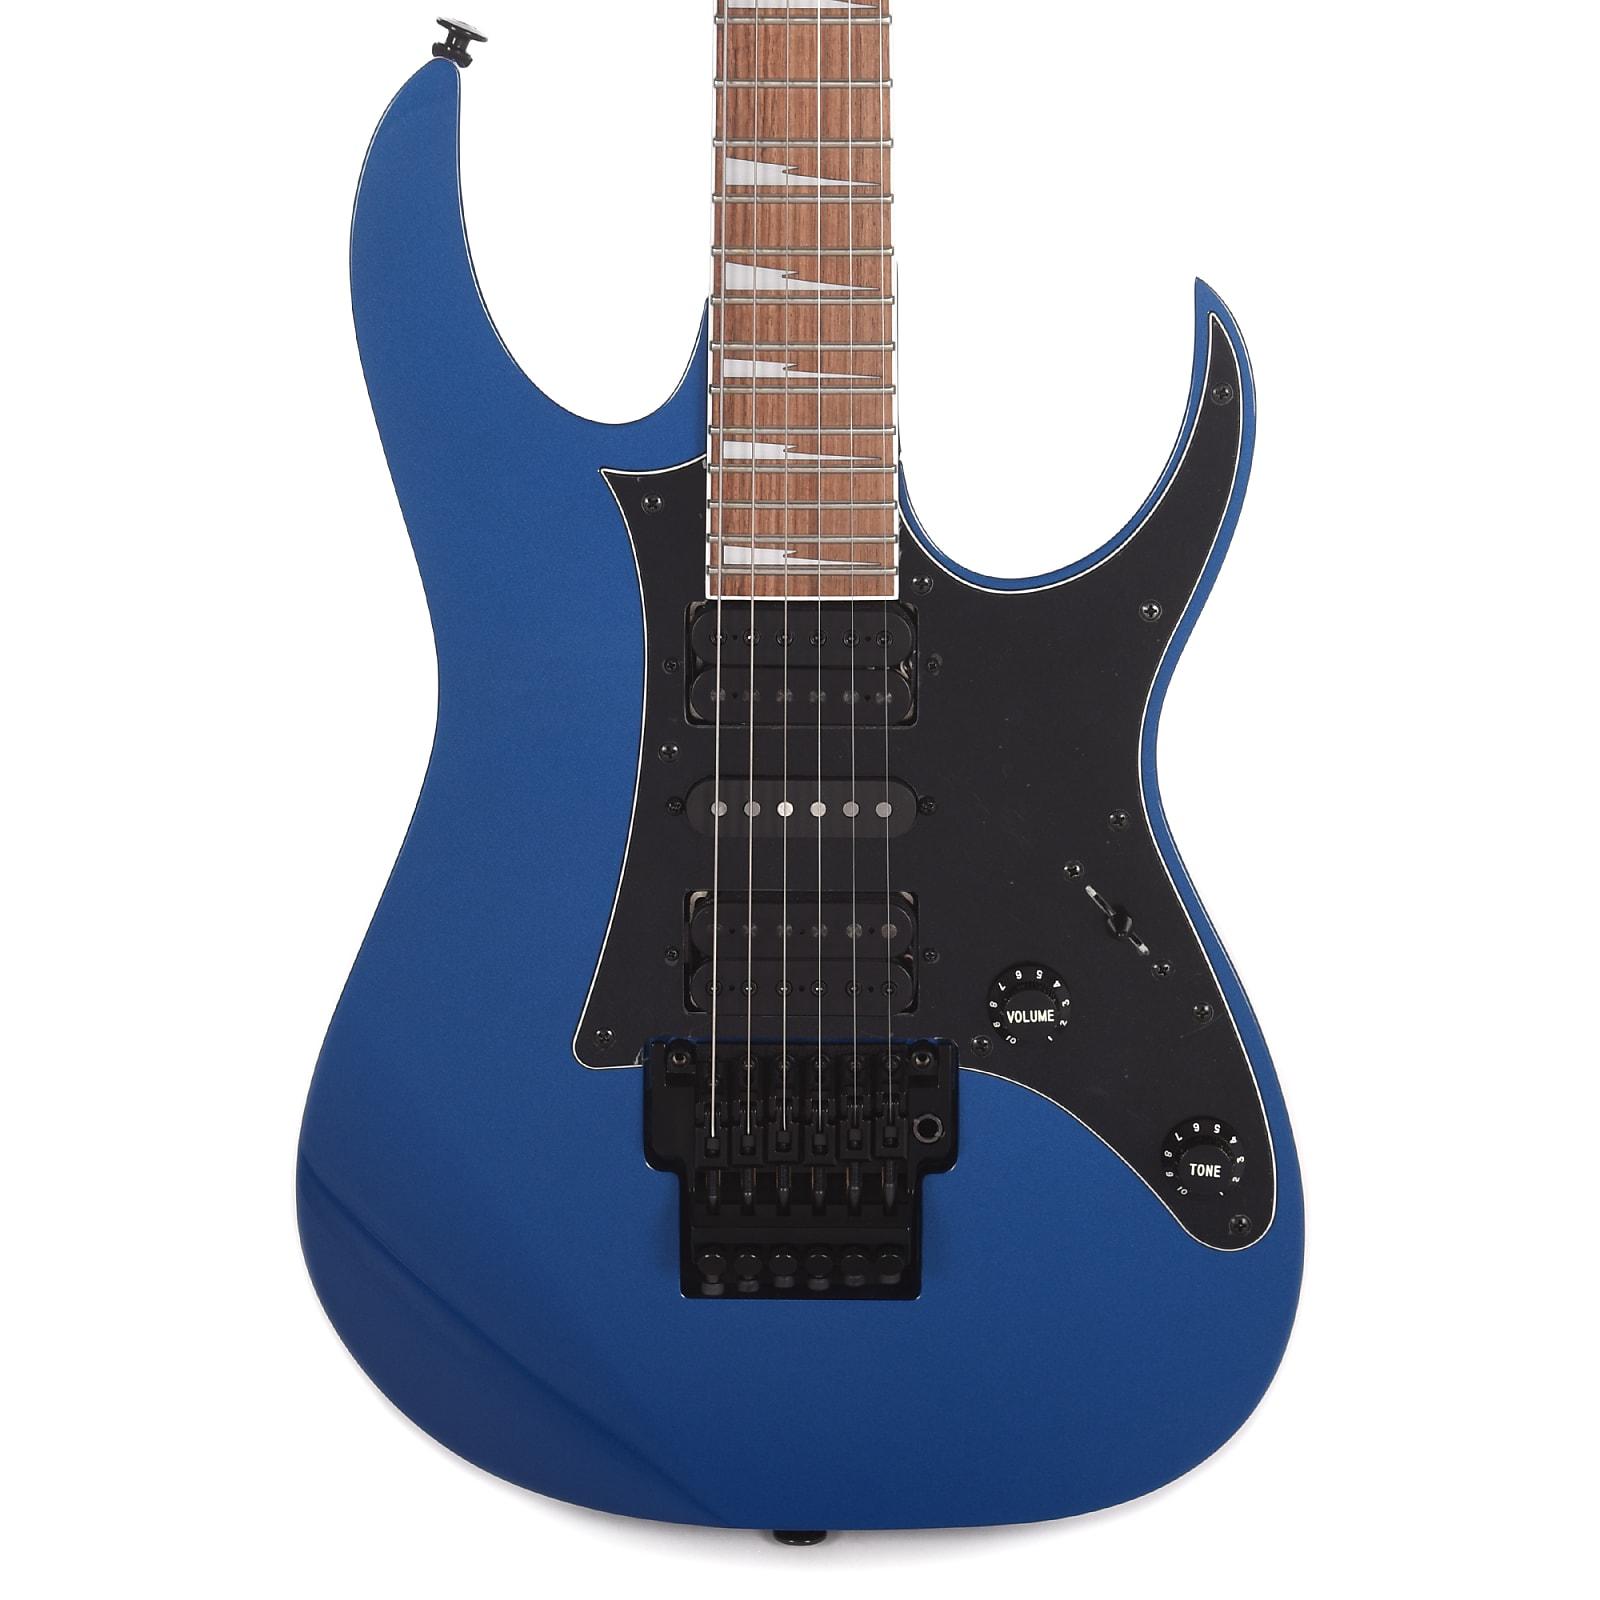 Ibanez RG550DX RG Genesis Collection Laser Blue